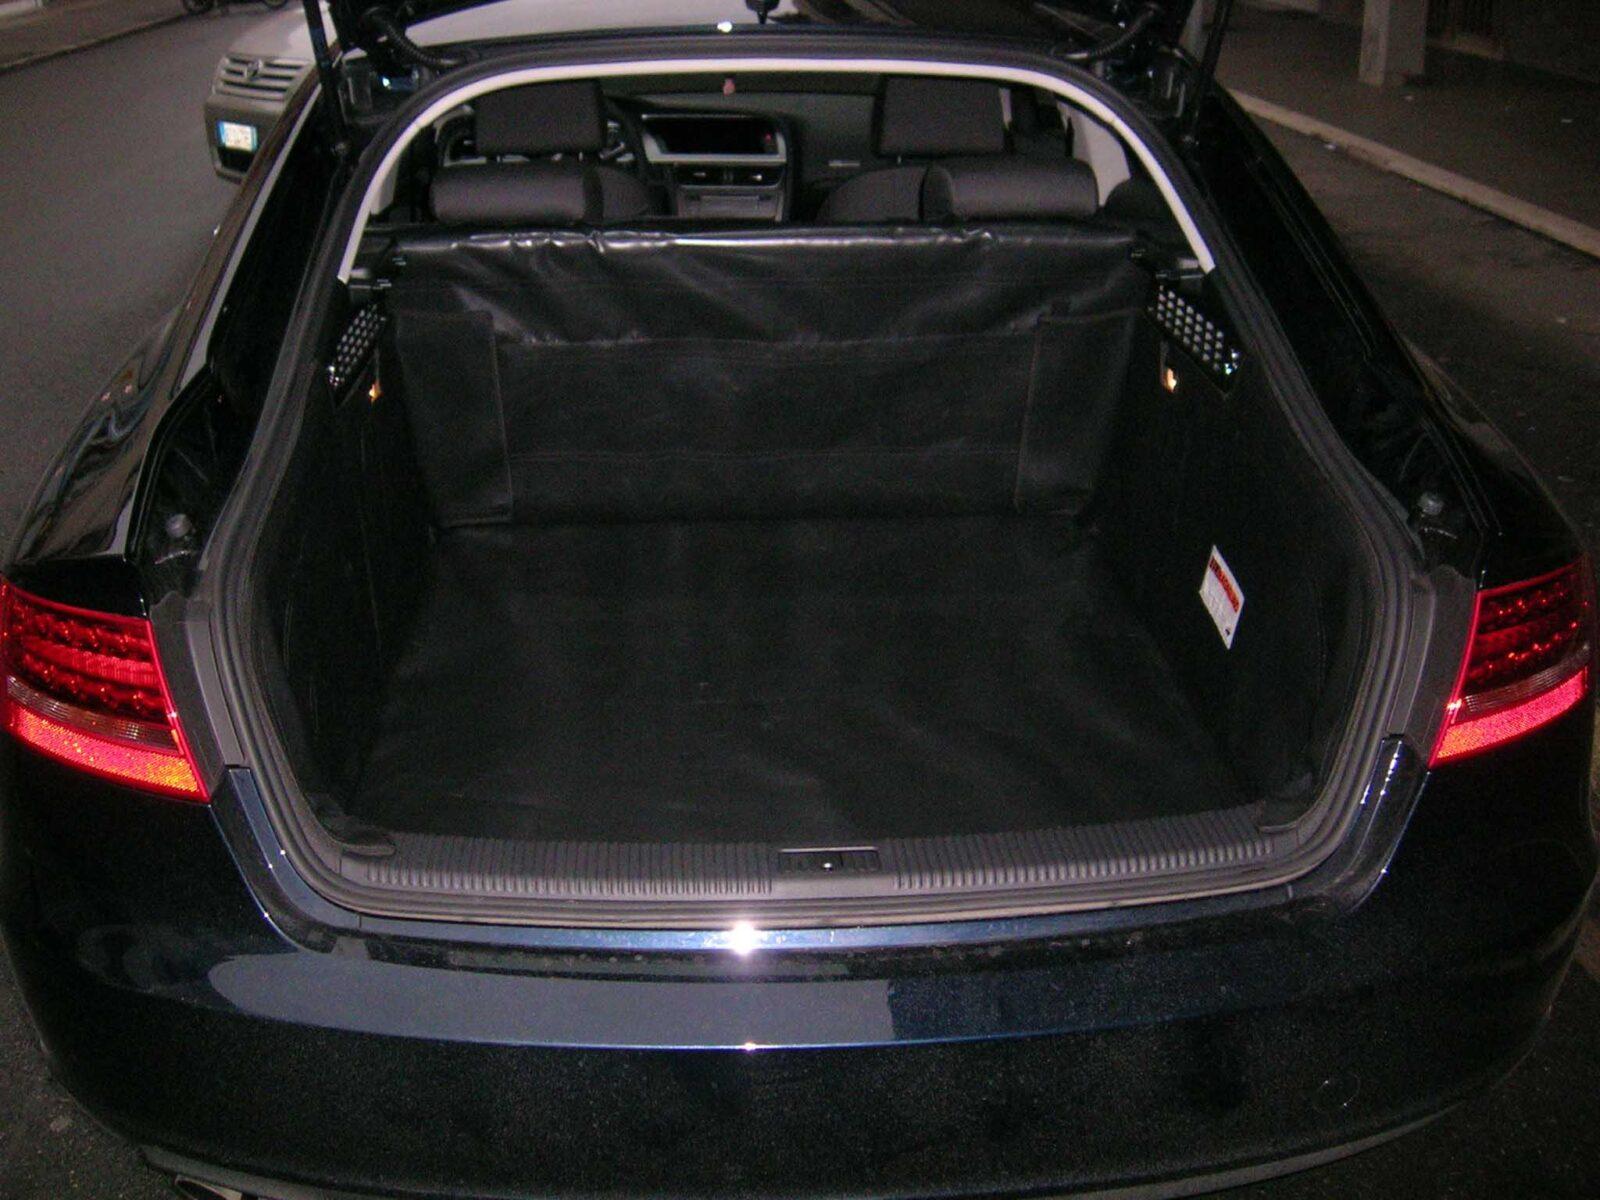 Salva baule Audi A5 Sportback telo cane